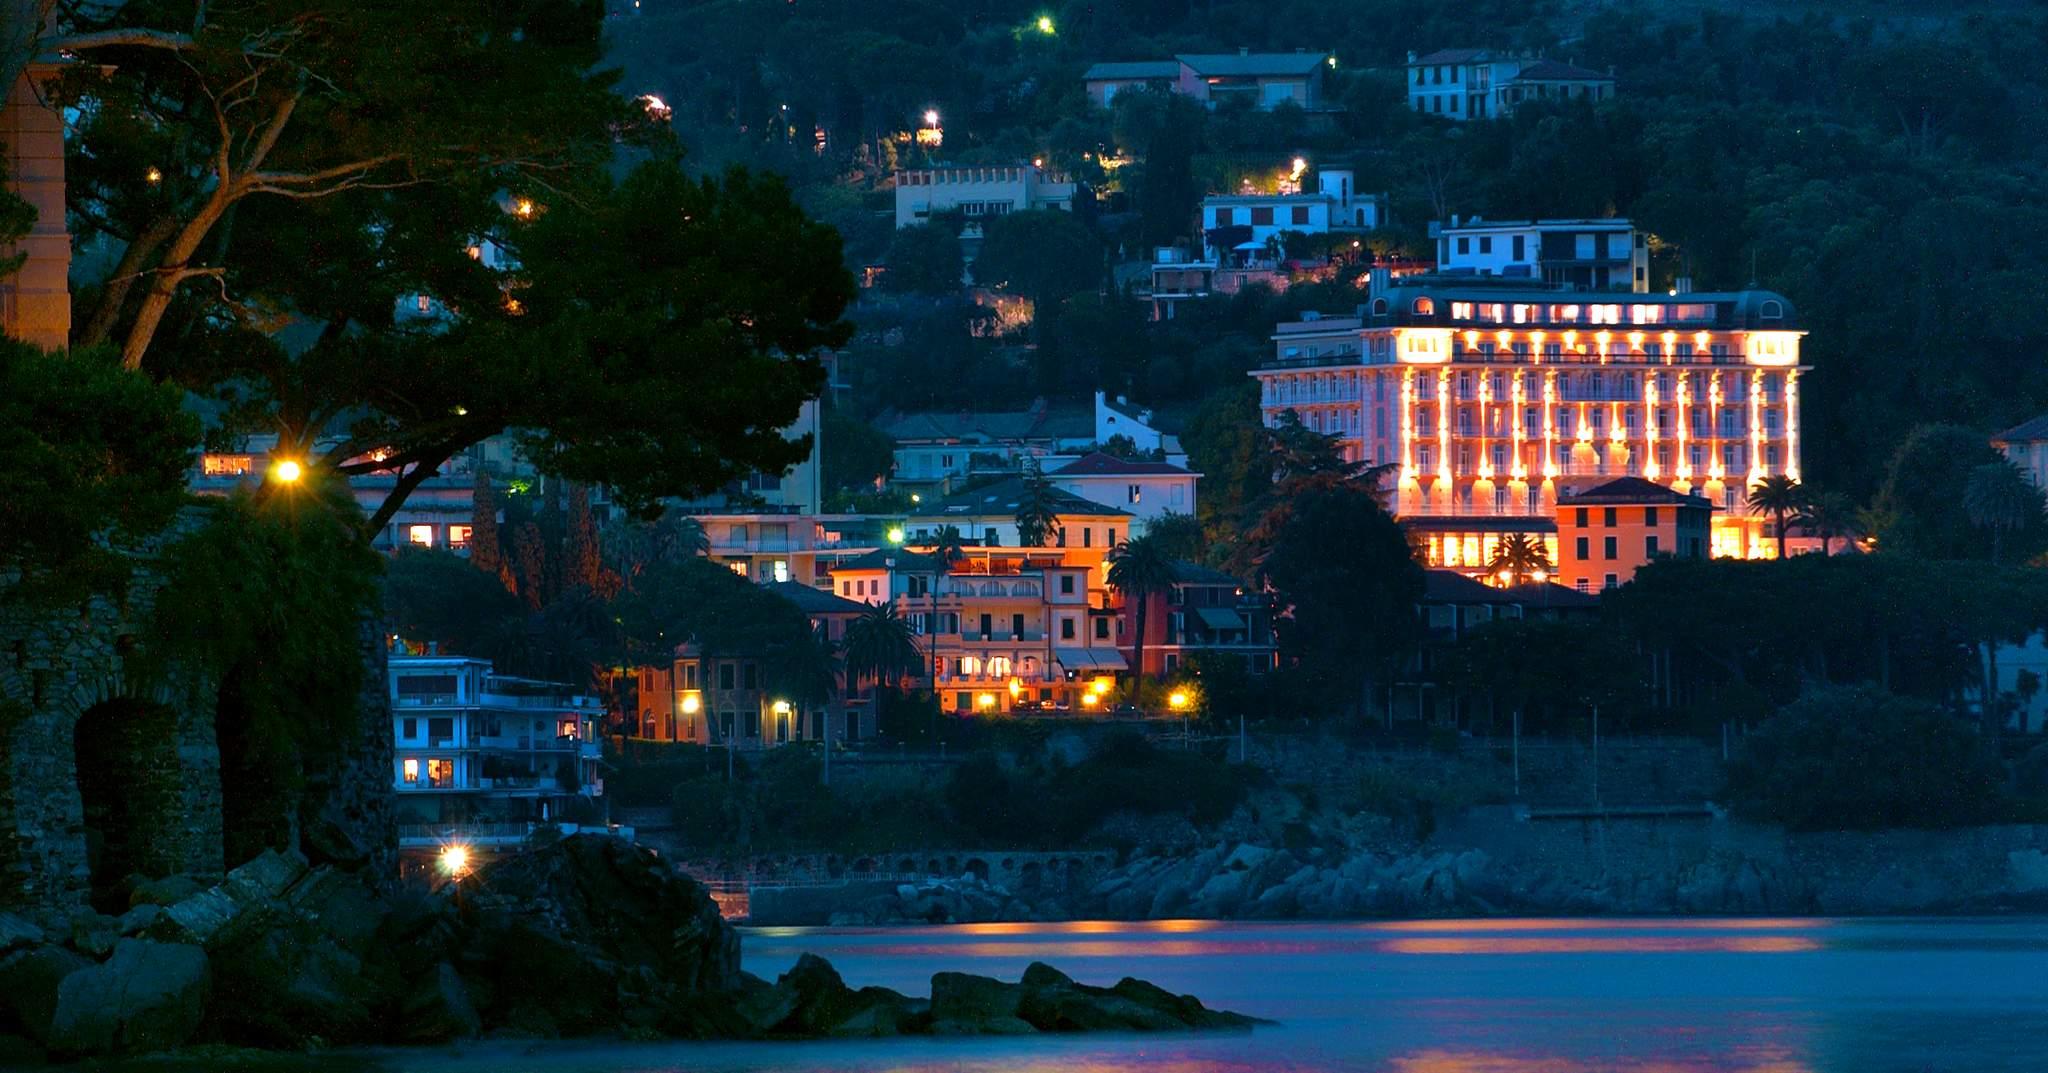 Hotel Bristol Rapallo Italy